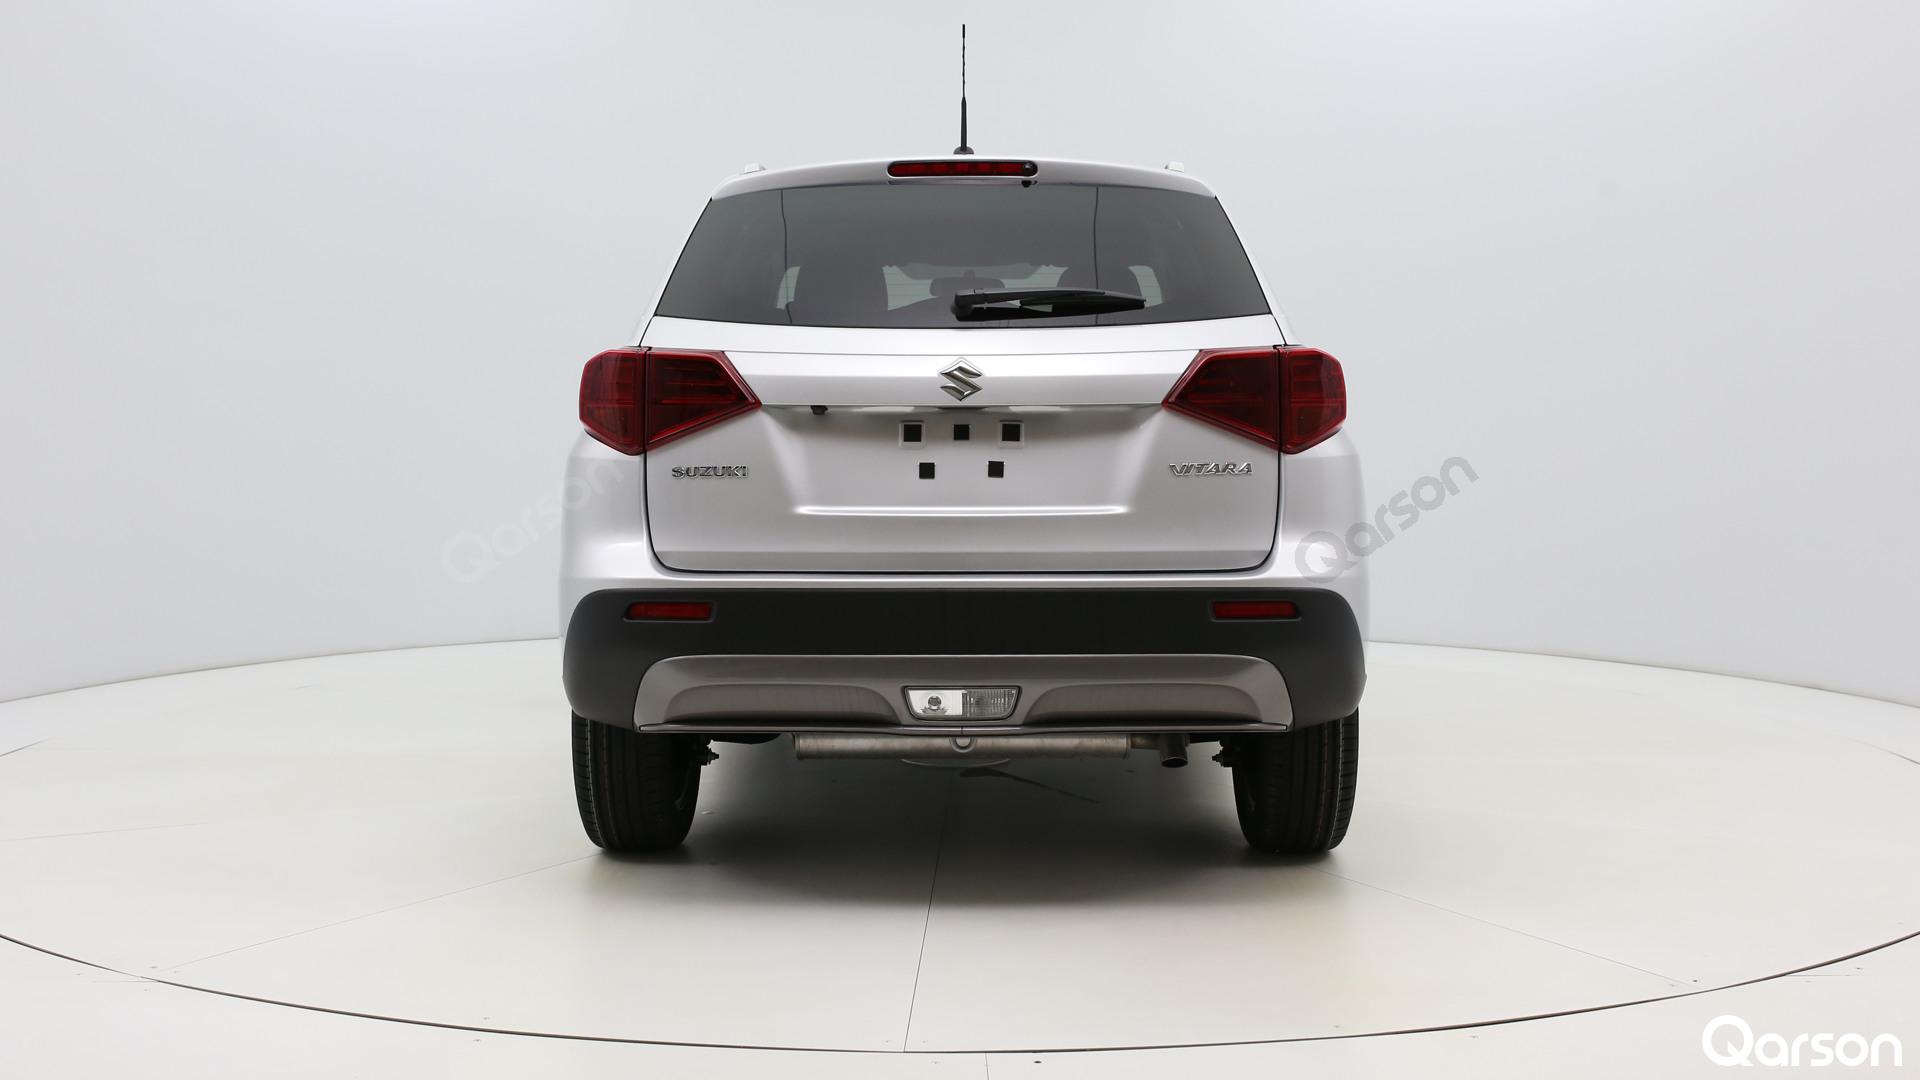 Suzuki Vitara Widok tyłu auta